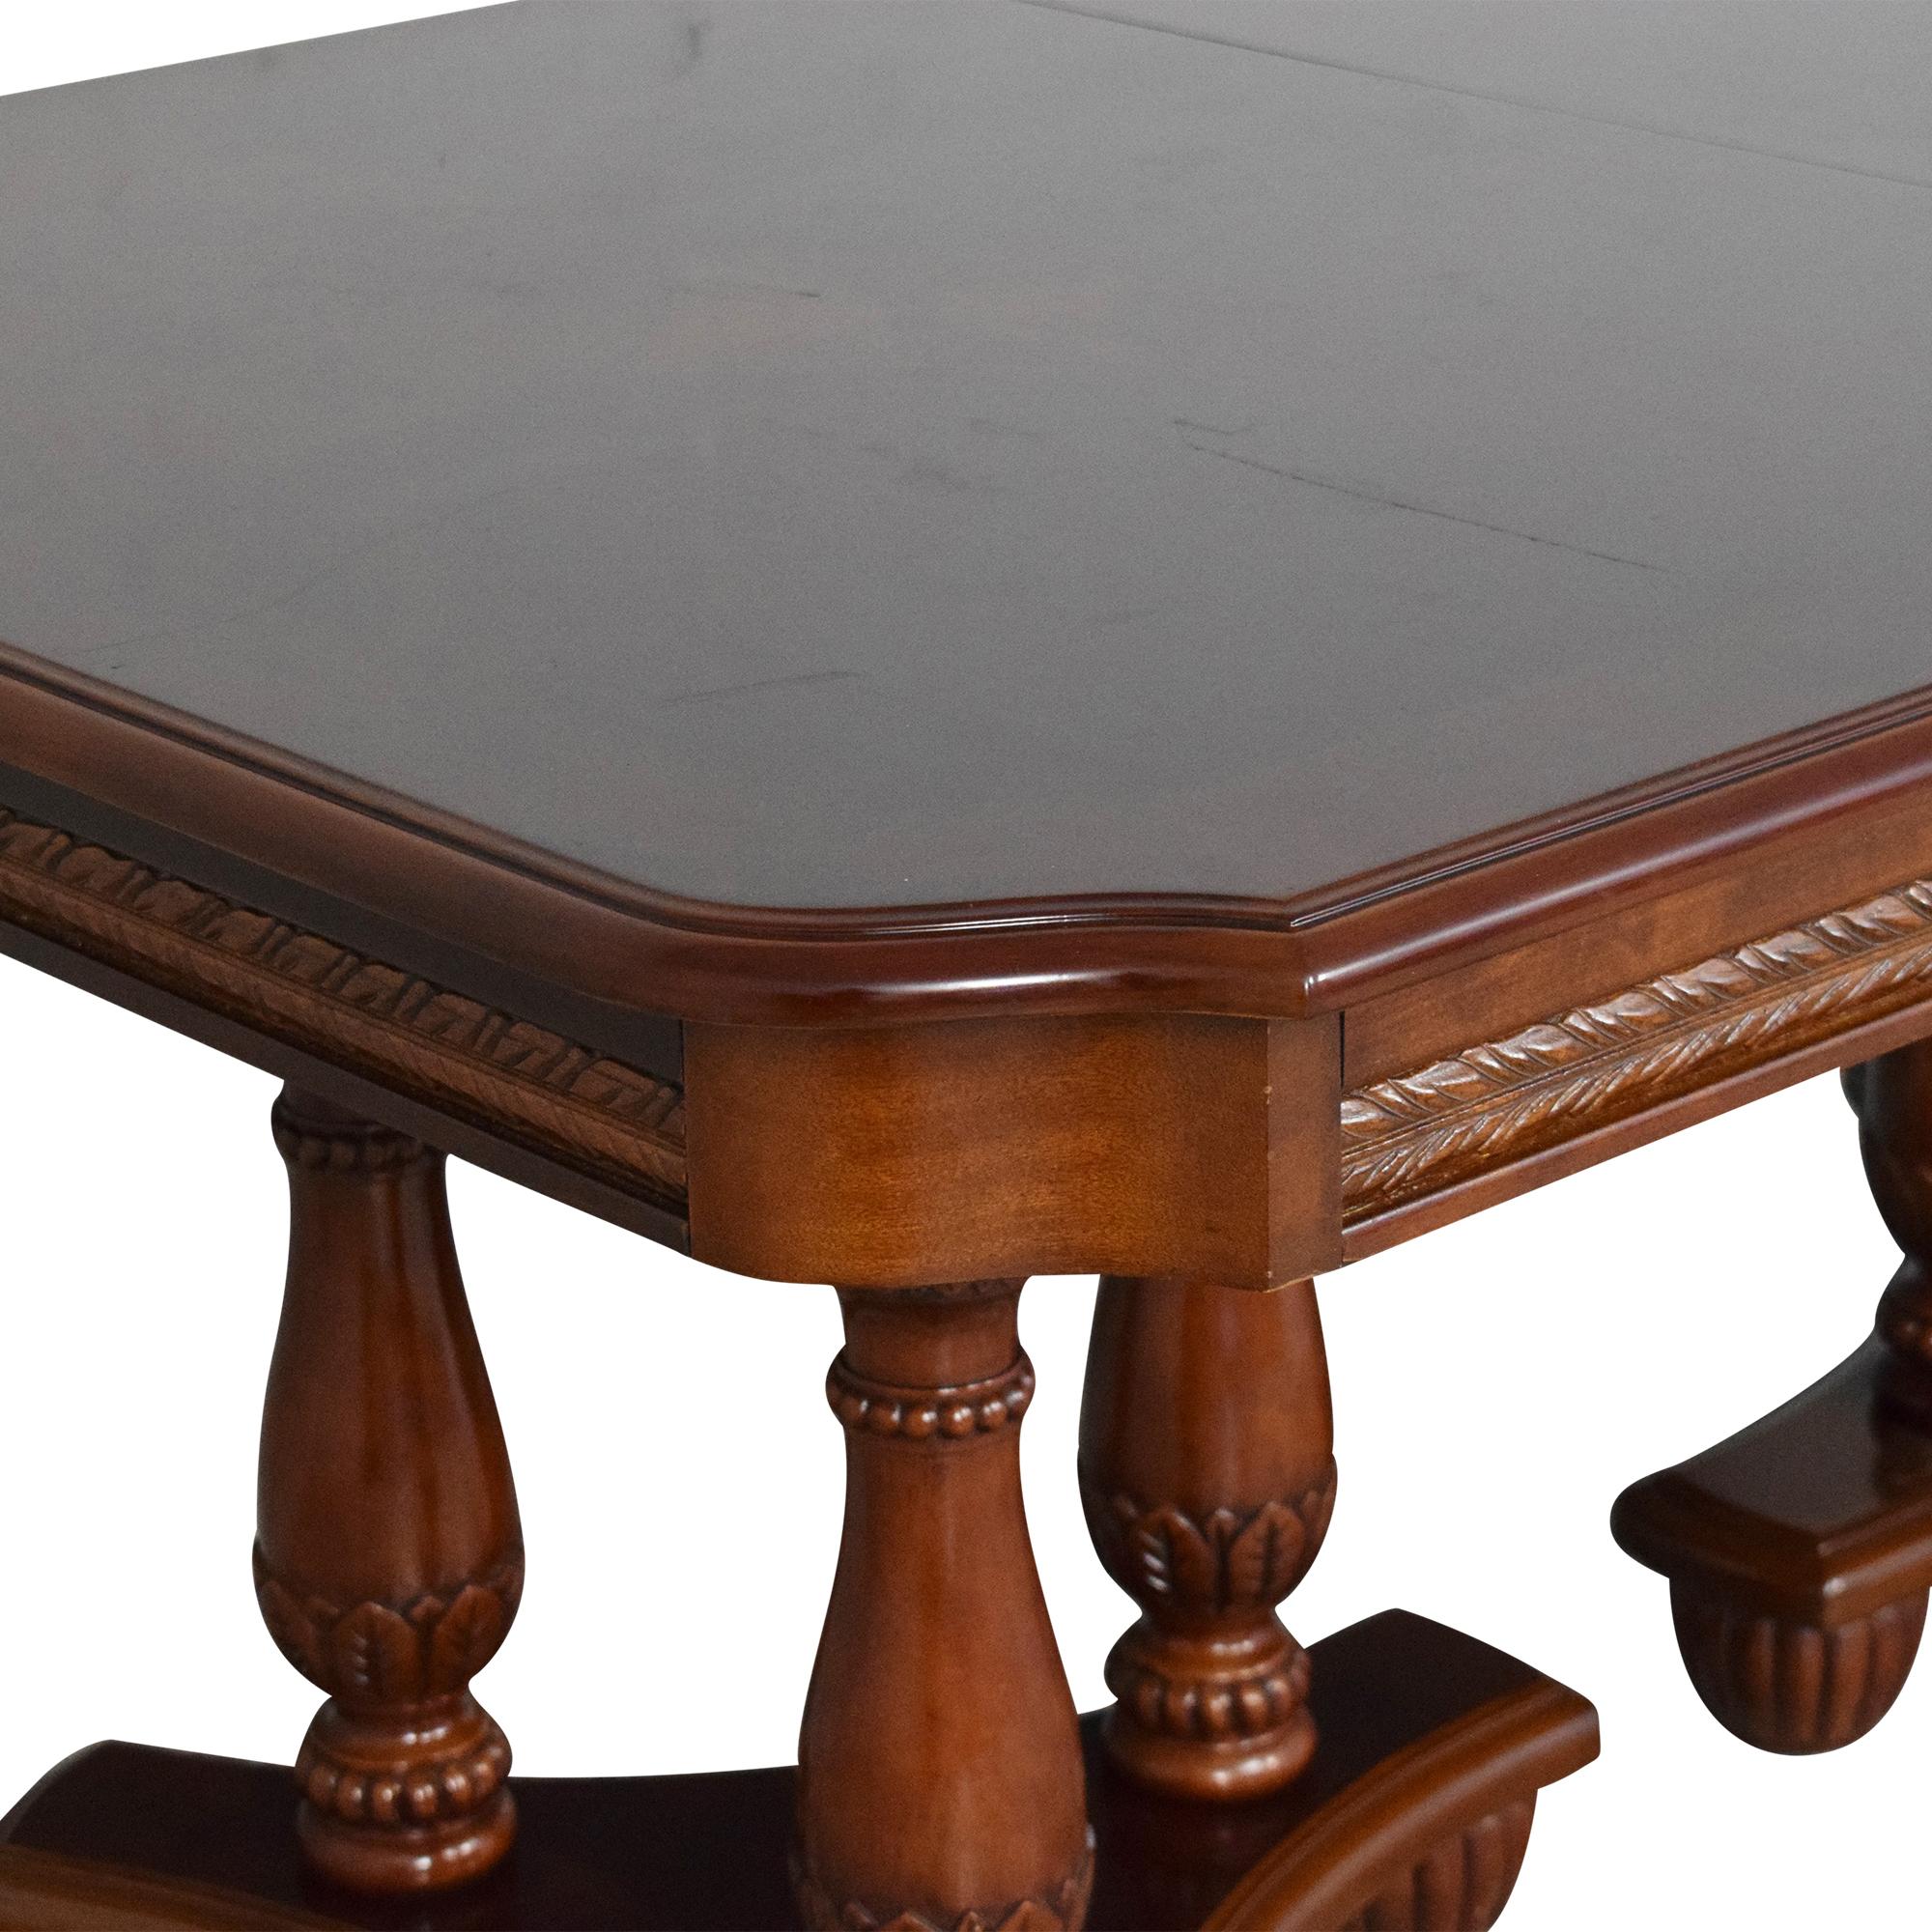 North Carolina Furniture Company North Carolina Furniture Extendable Dining Table discount